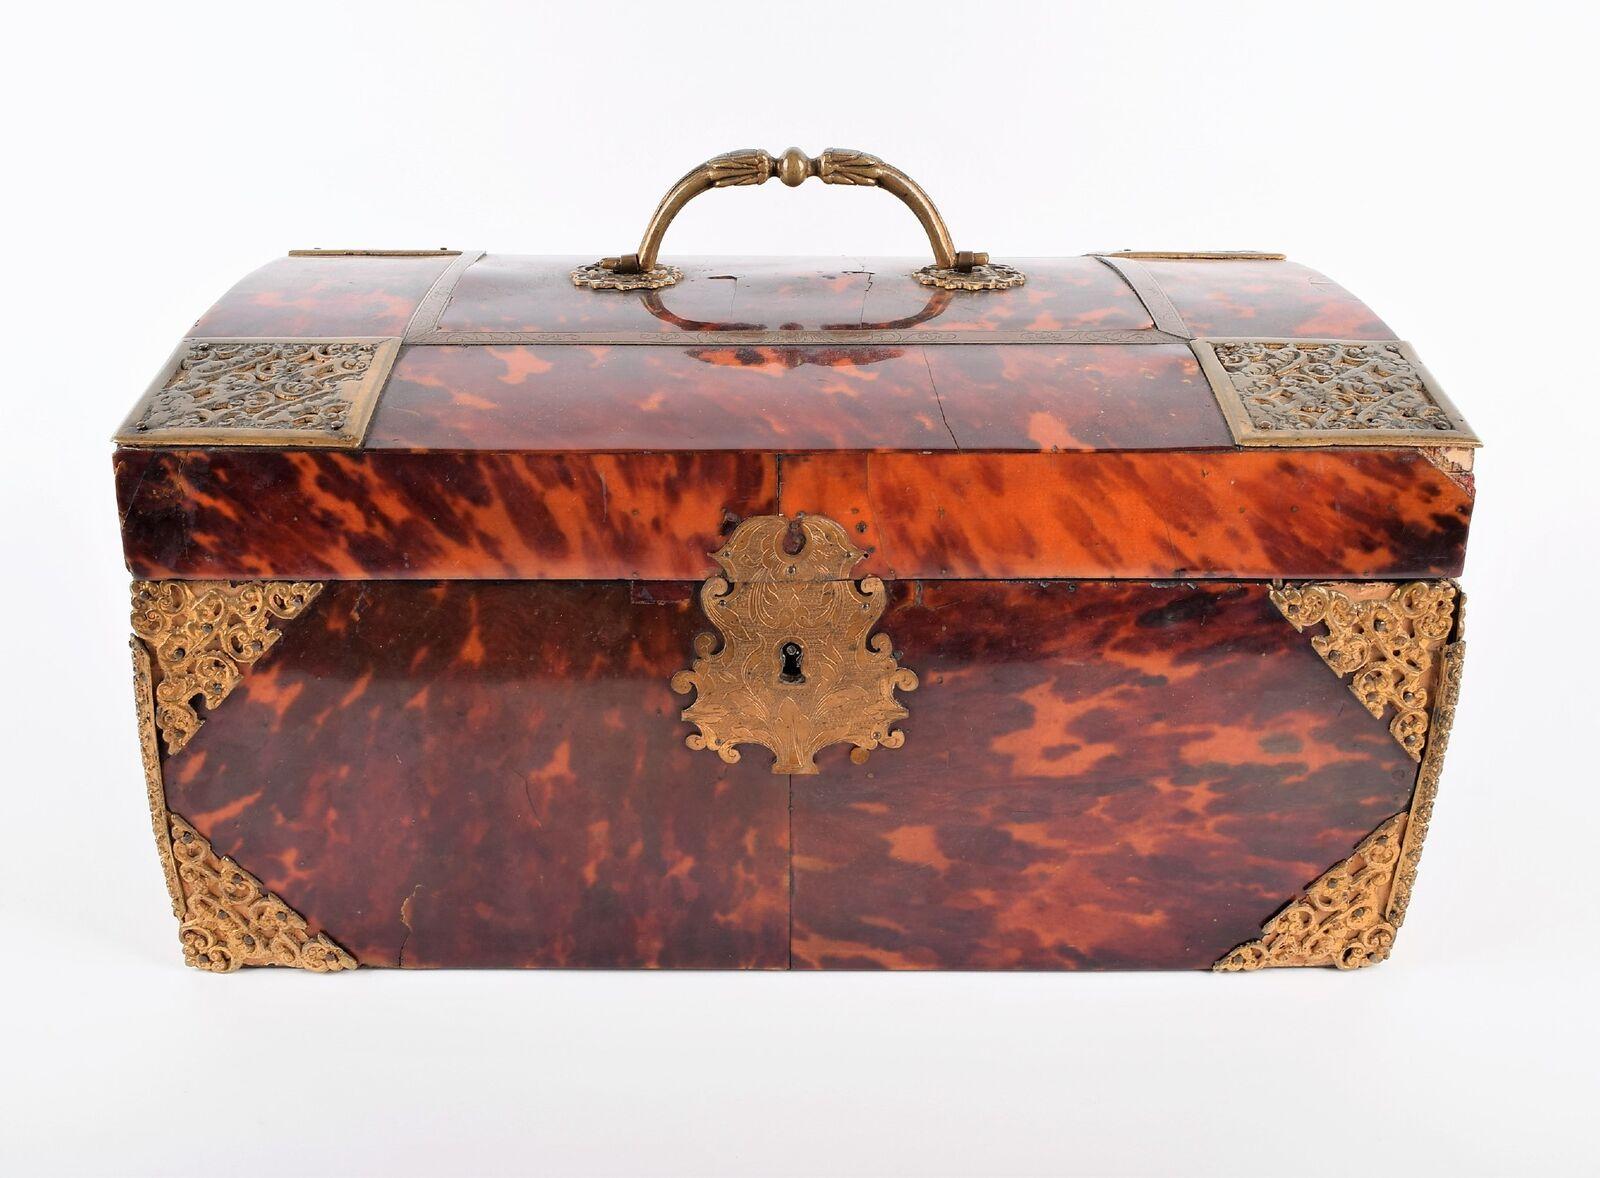 Lot 310: A large 18th-century tortoiseshell chest